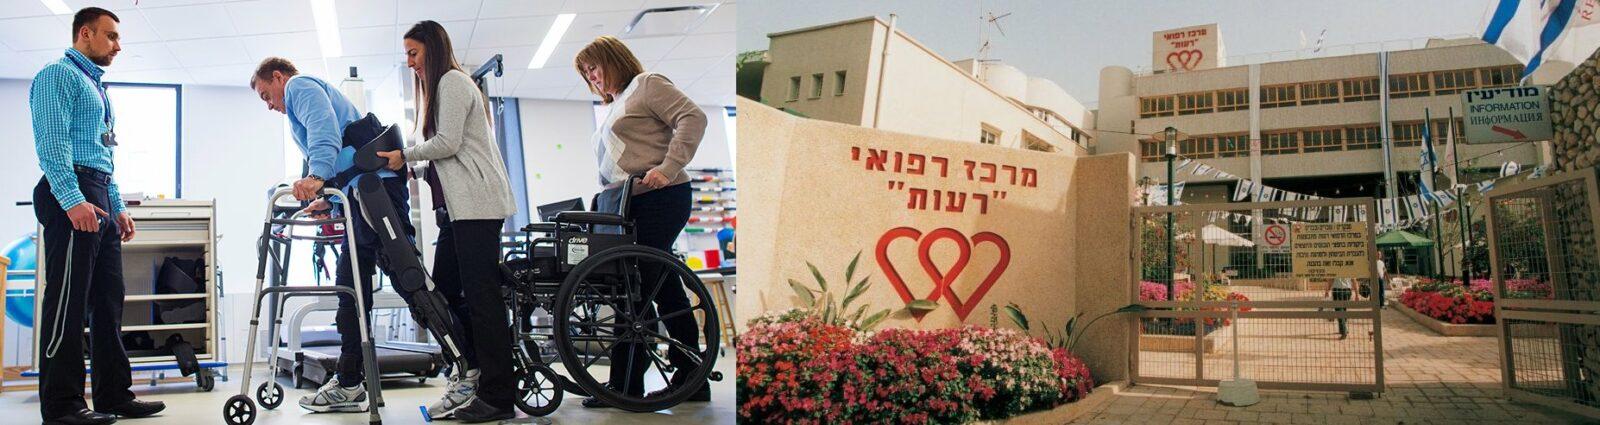 Reuth Rehabilitation Center